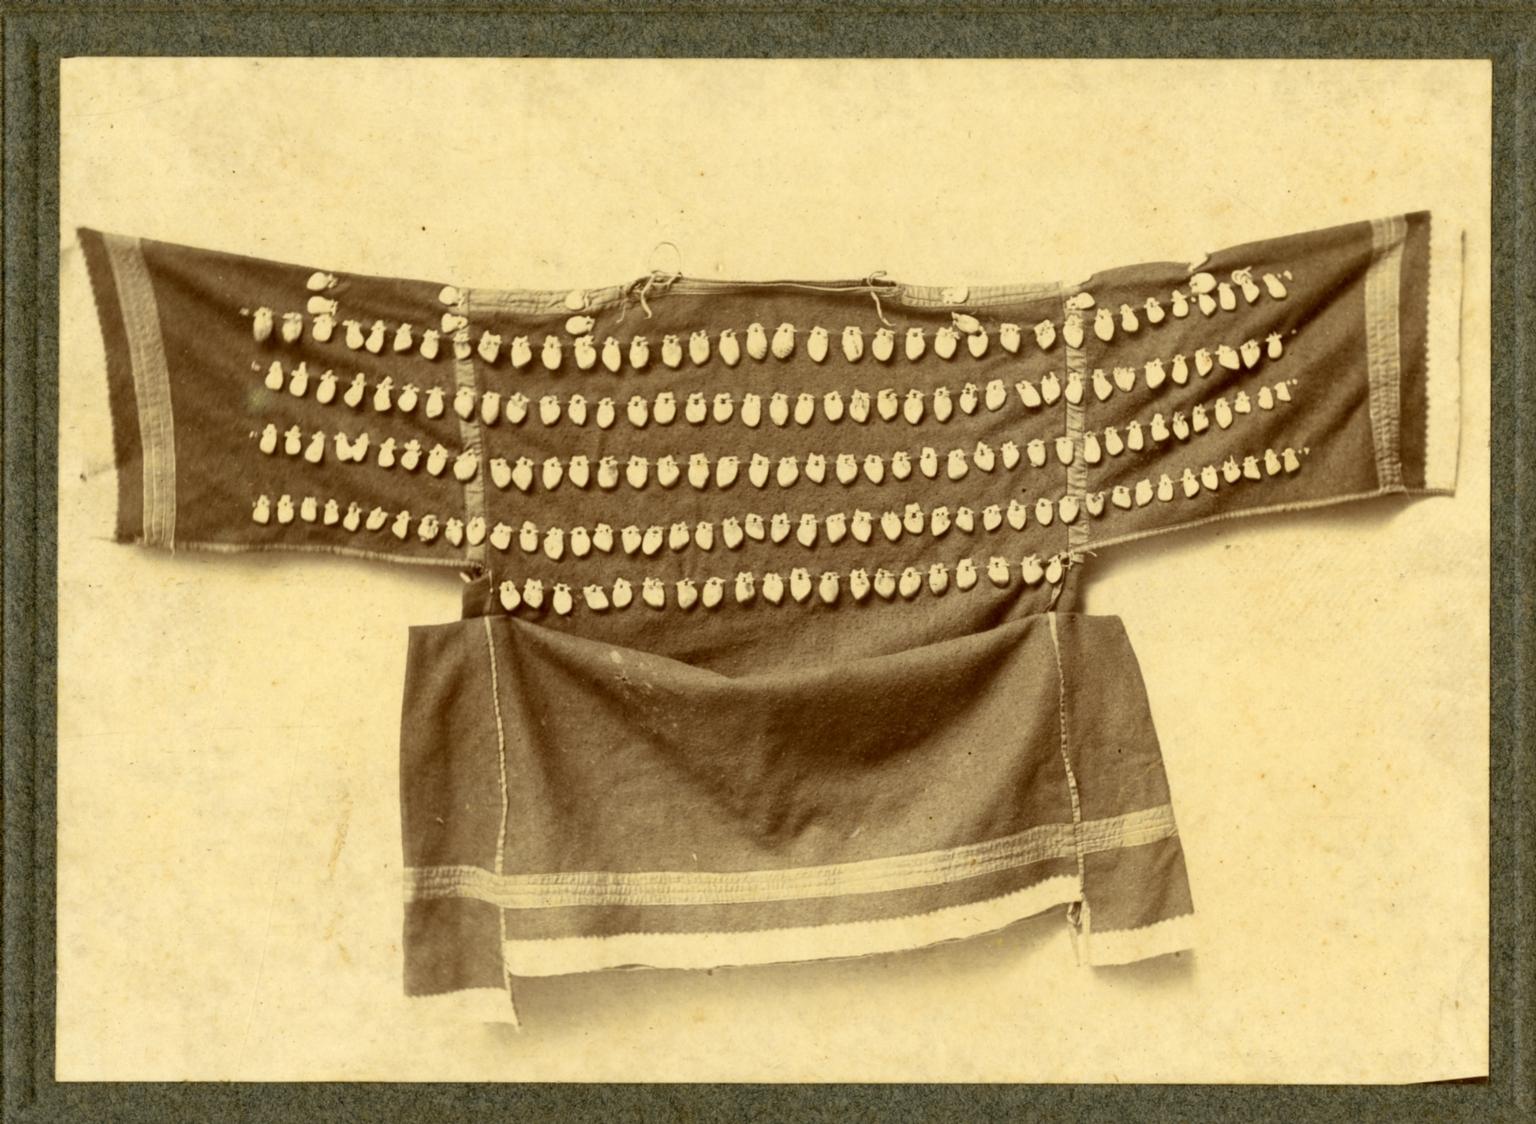 Cheyenne elk tooth dress